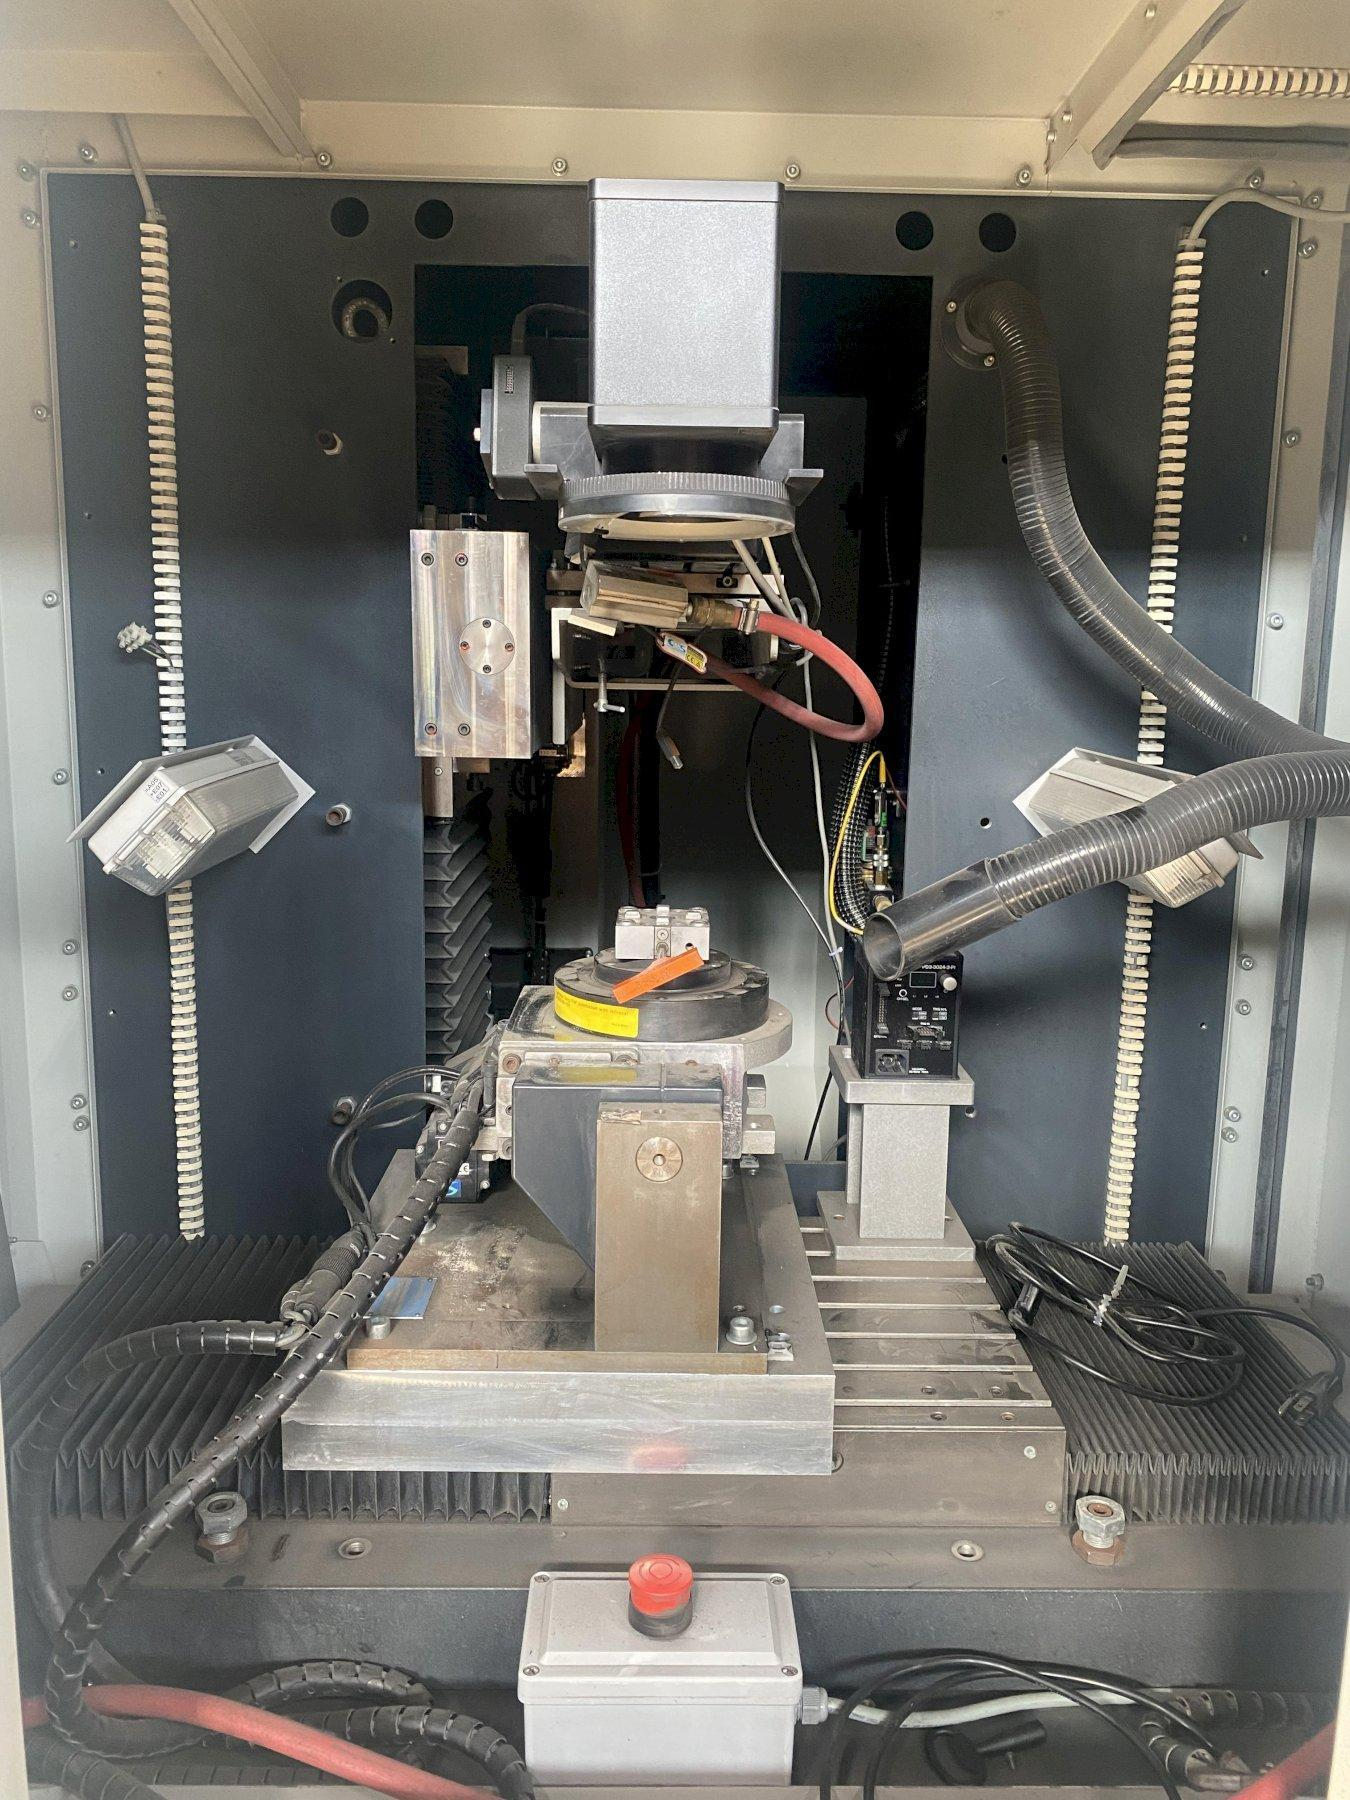 "FOBA GP9000 CNC LASER ENGRAVING/ MARKING MACHINE, PC-Based CNC Control, Travels X=19.69"", Y=19.69"", Z= 19.69"", 4.72"" x 4.72""² Engraving Field, 100W YAG Laser, New 2011."